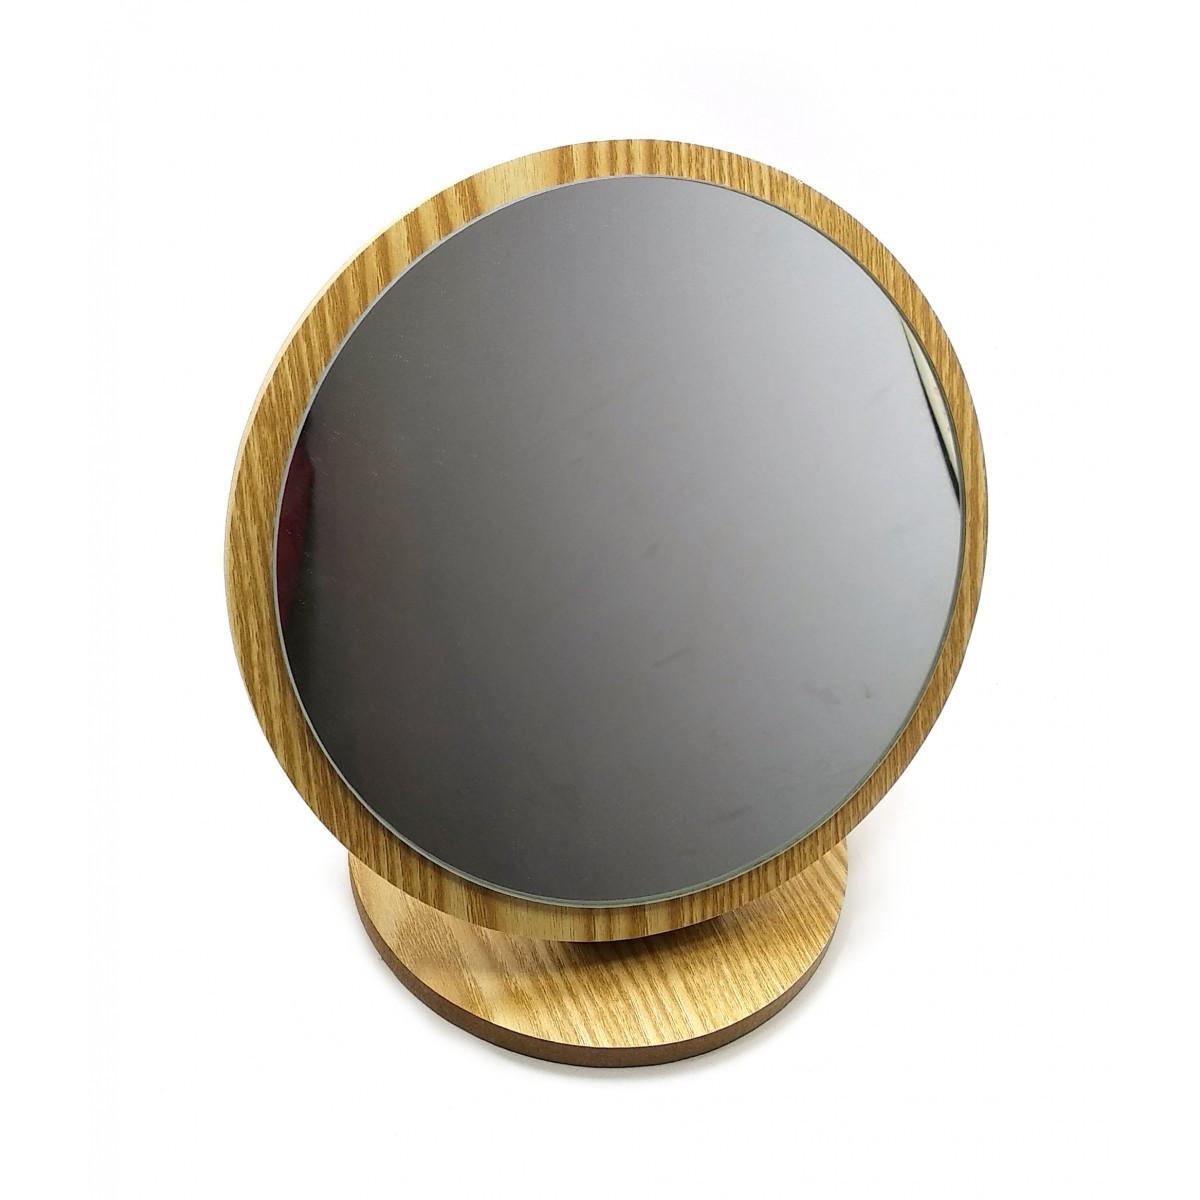 Зеркальце настольное круглое (d-19 см h-20.5 см)